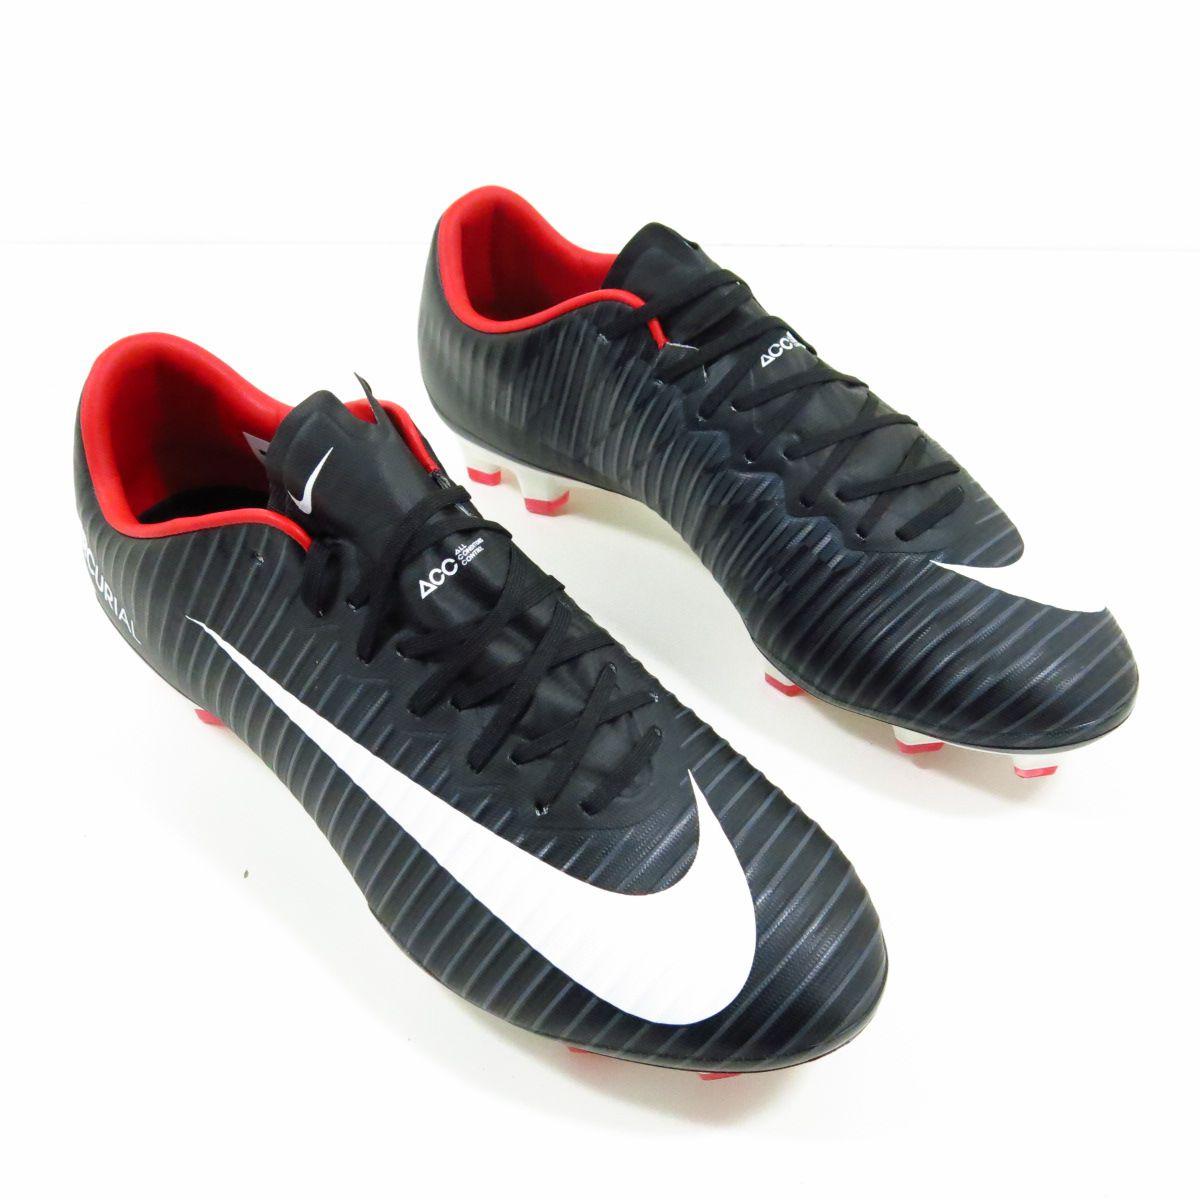 Chuteira Nike Mercurial Vapor FG Elite